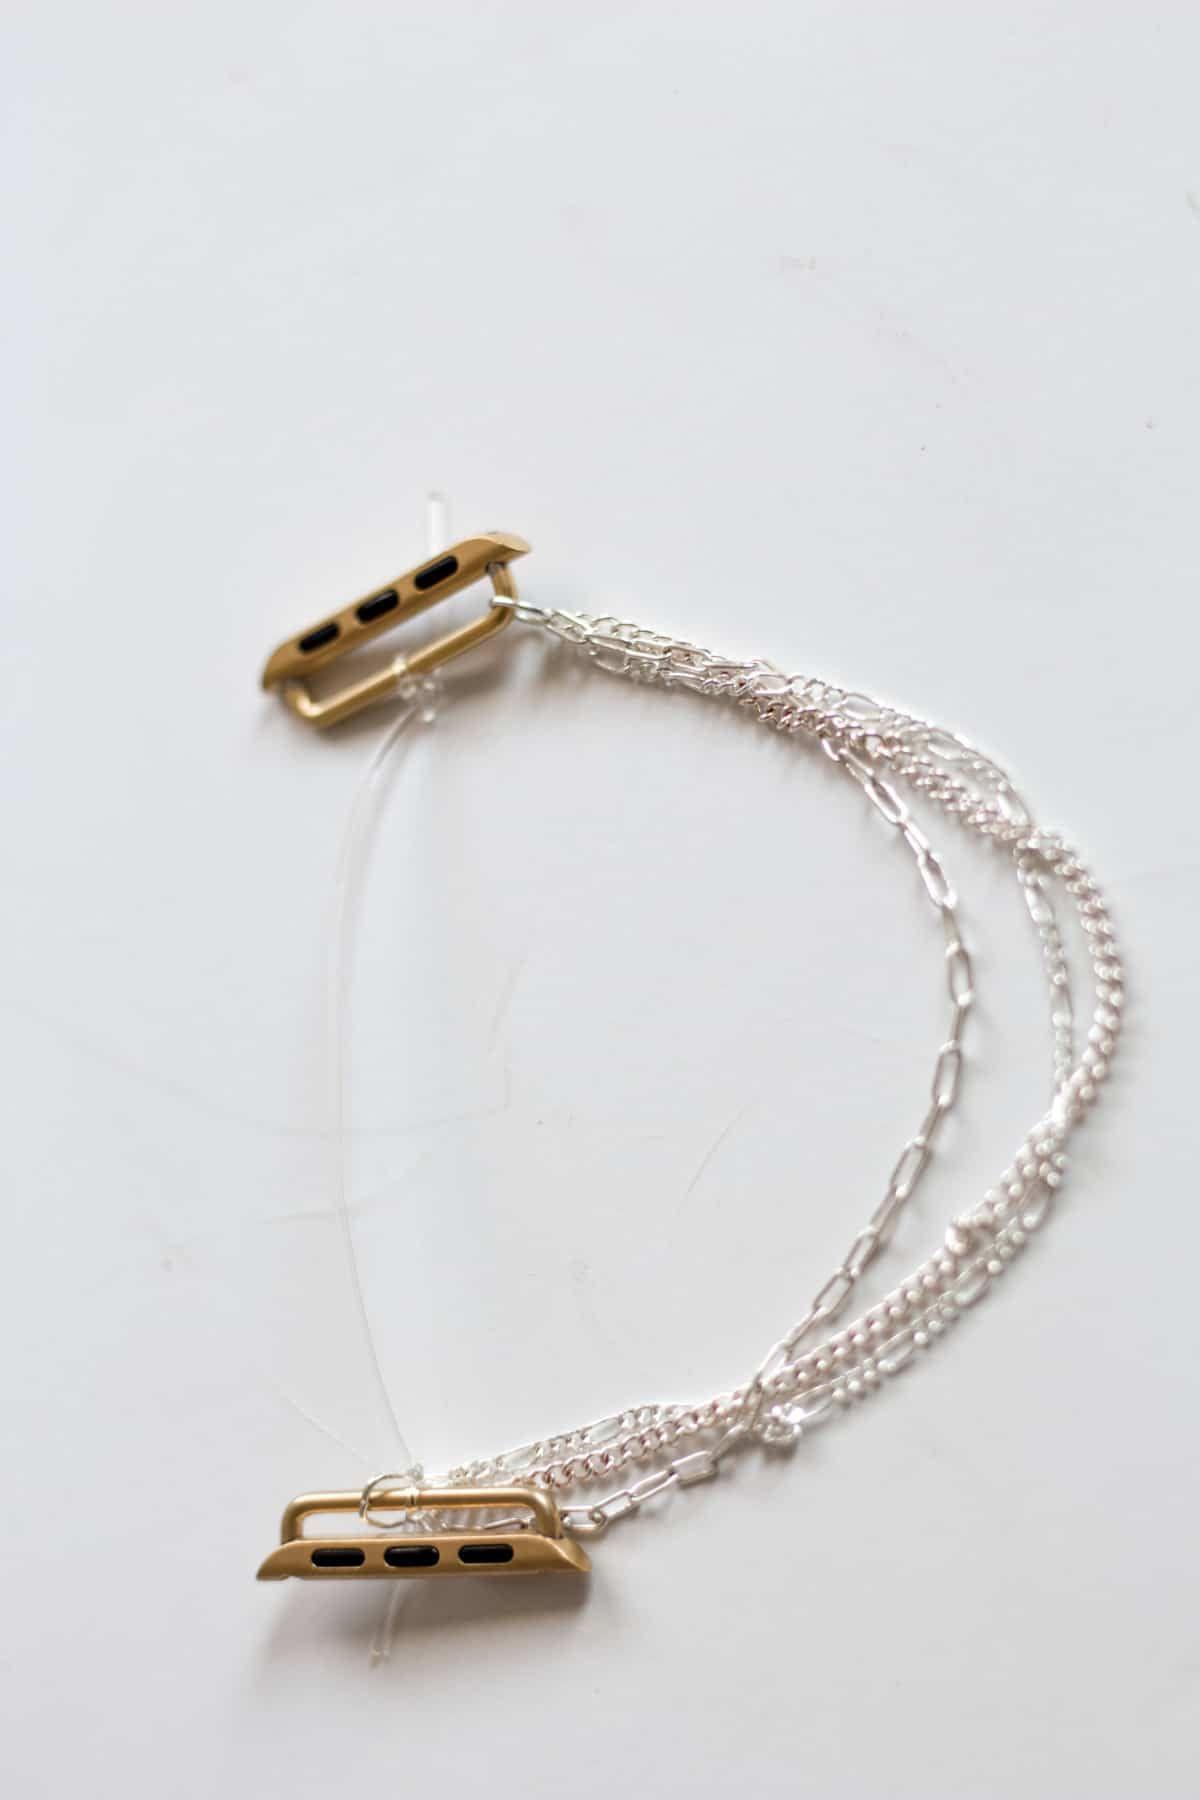 Diy Apple Watch Band Apple Watch Bands Women Apple Watch Bracelets Diy Watch Band